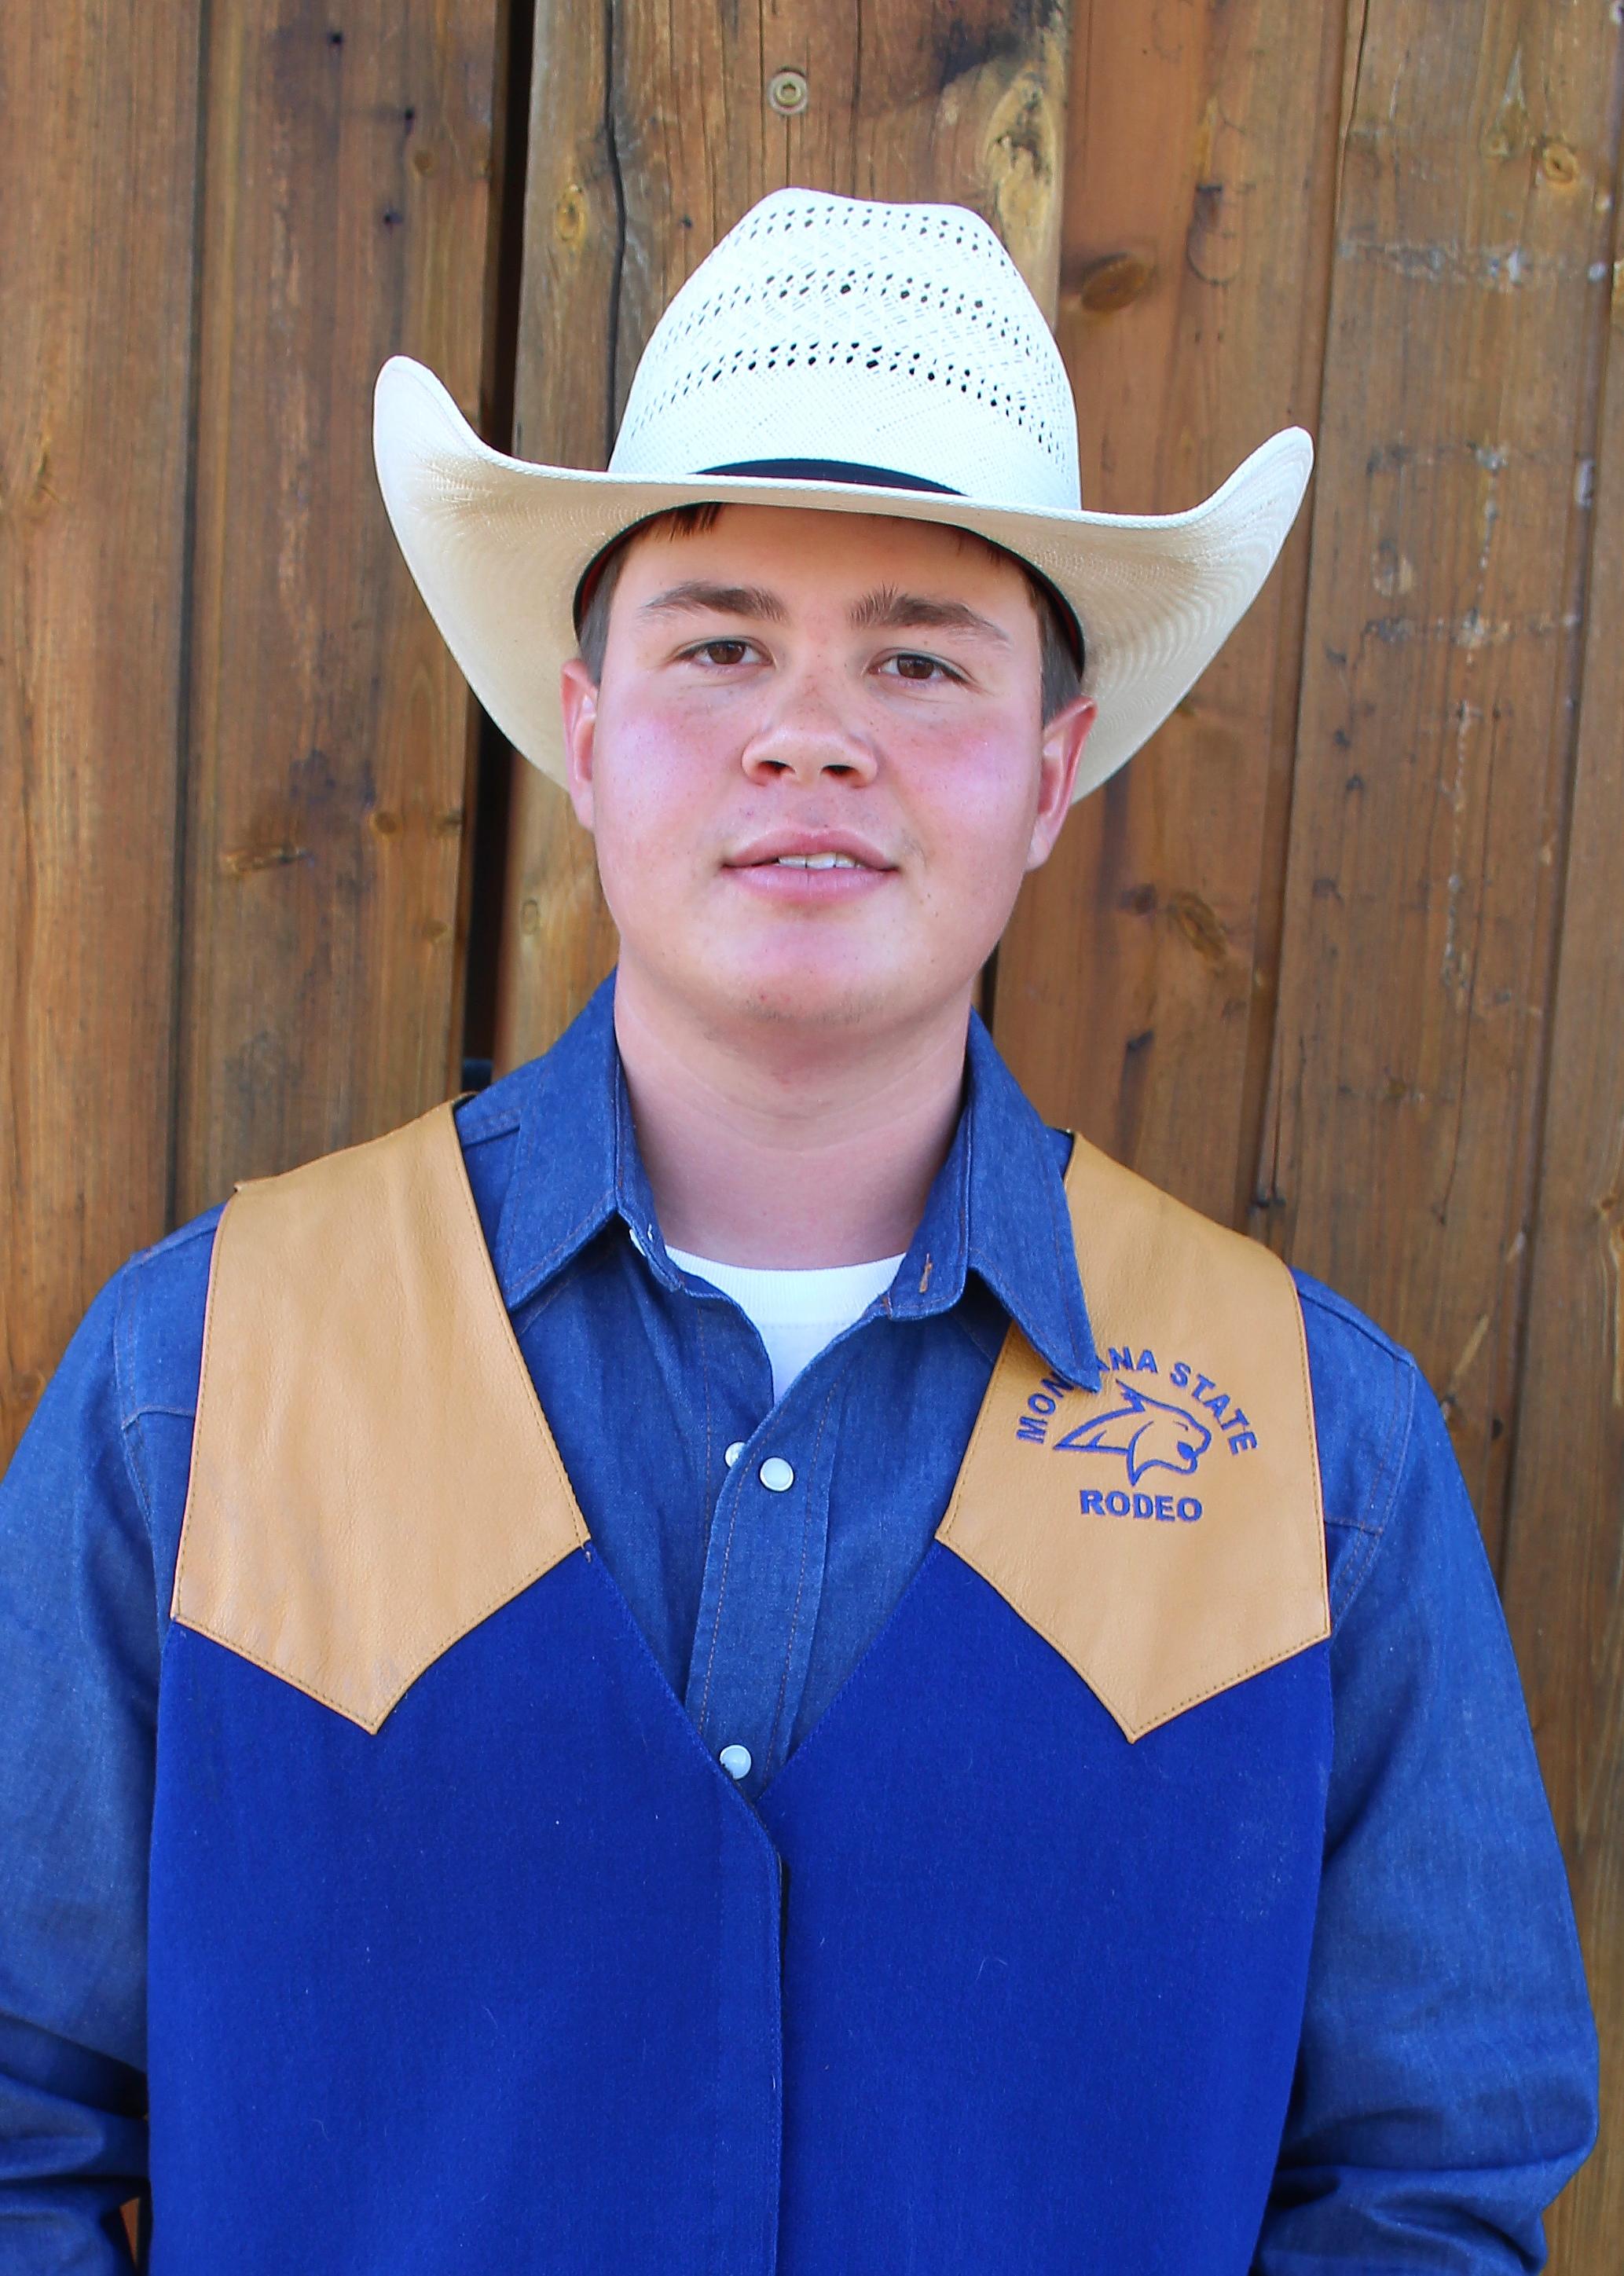 Freshmen Bobcat Rodeo Office Montana State University